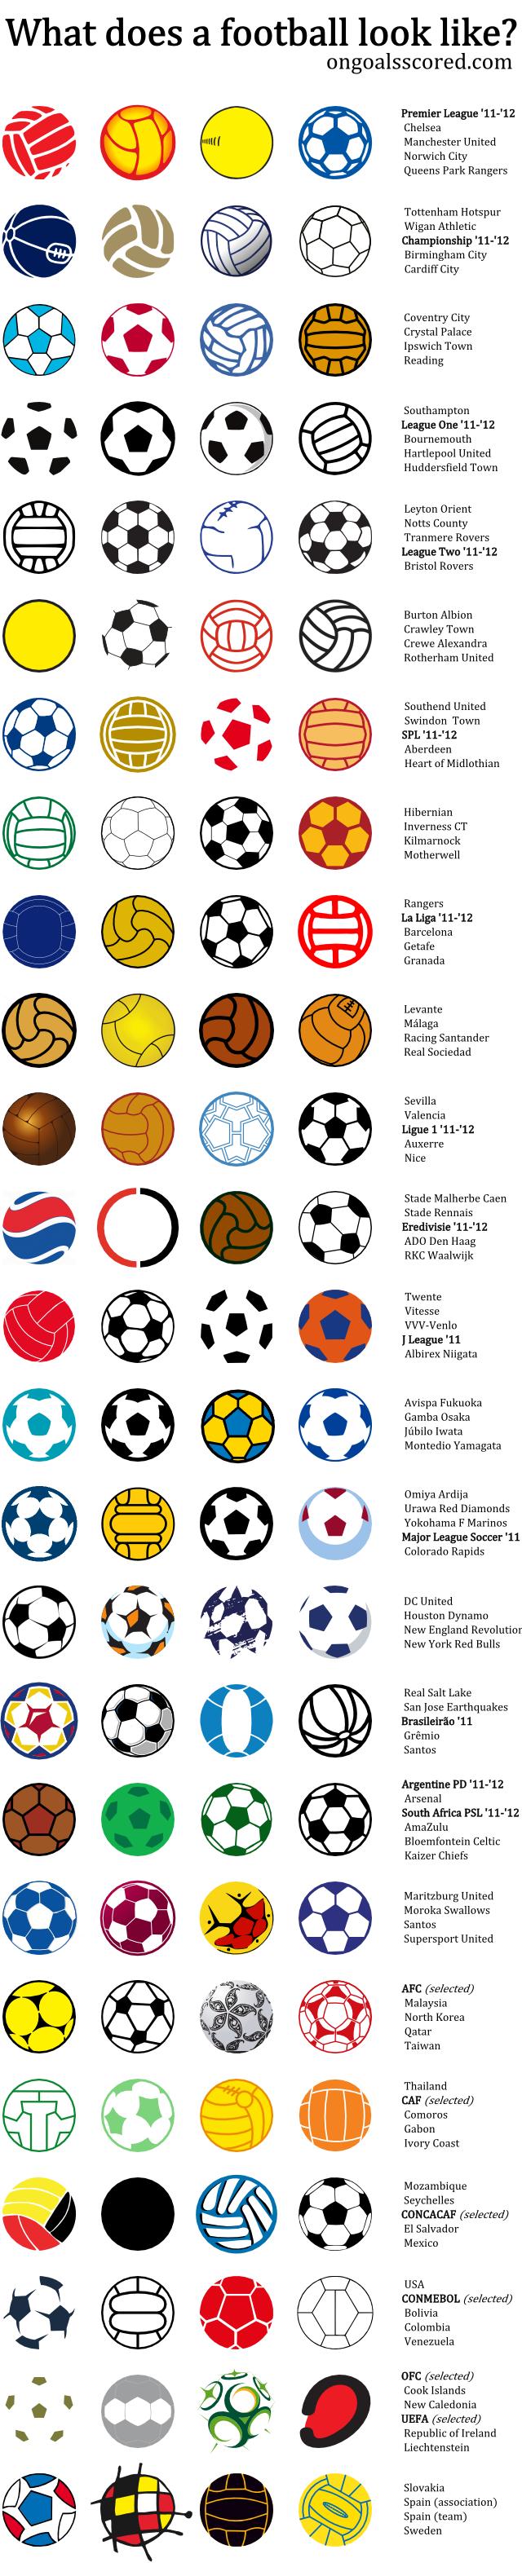 What Does A Football Look Like Football Logo Design Soccer Logo Football Design